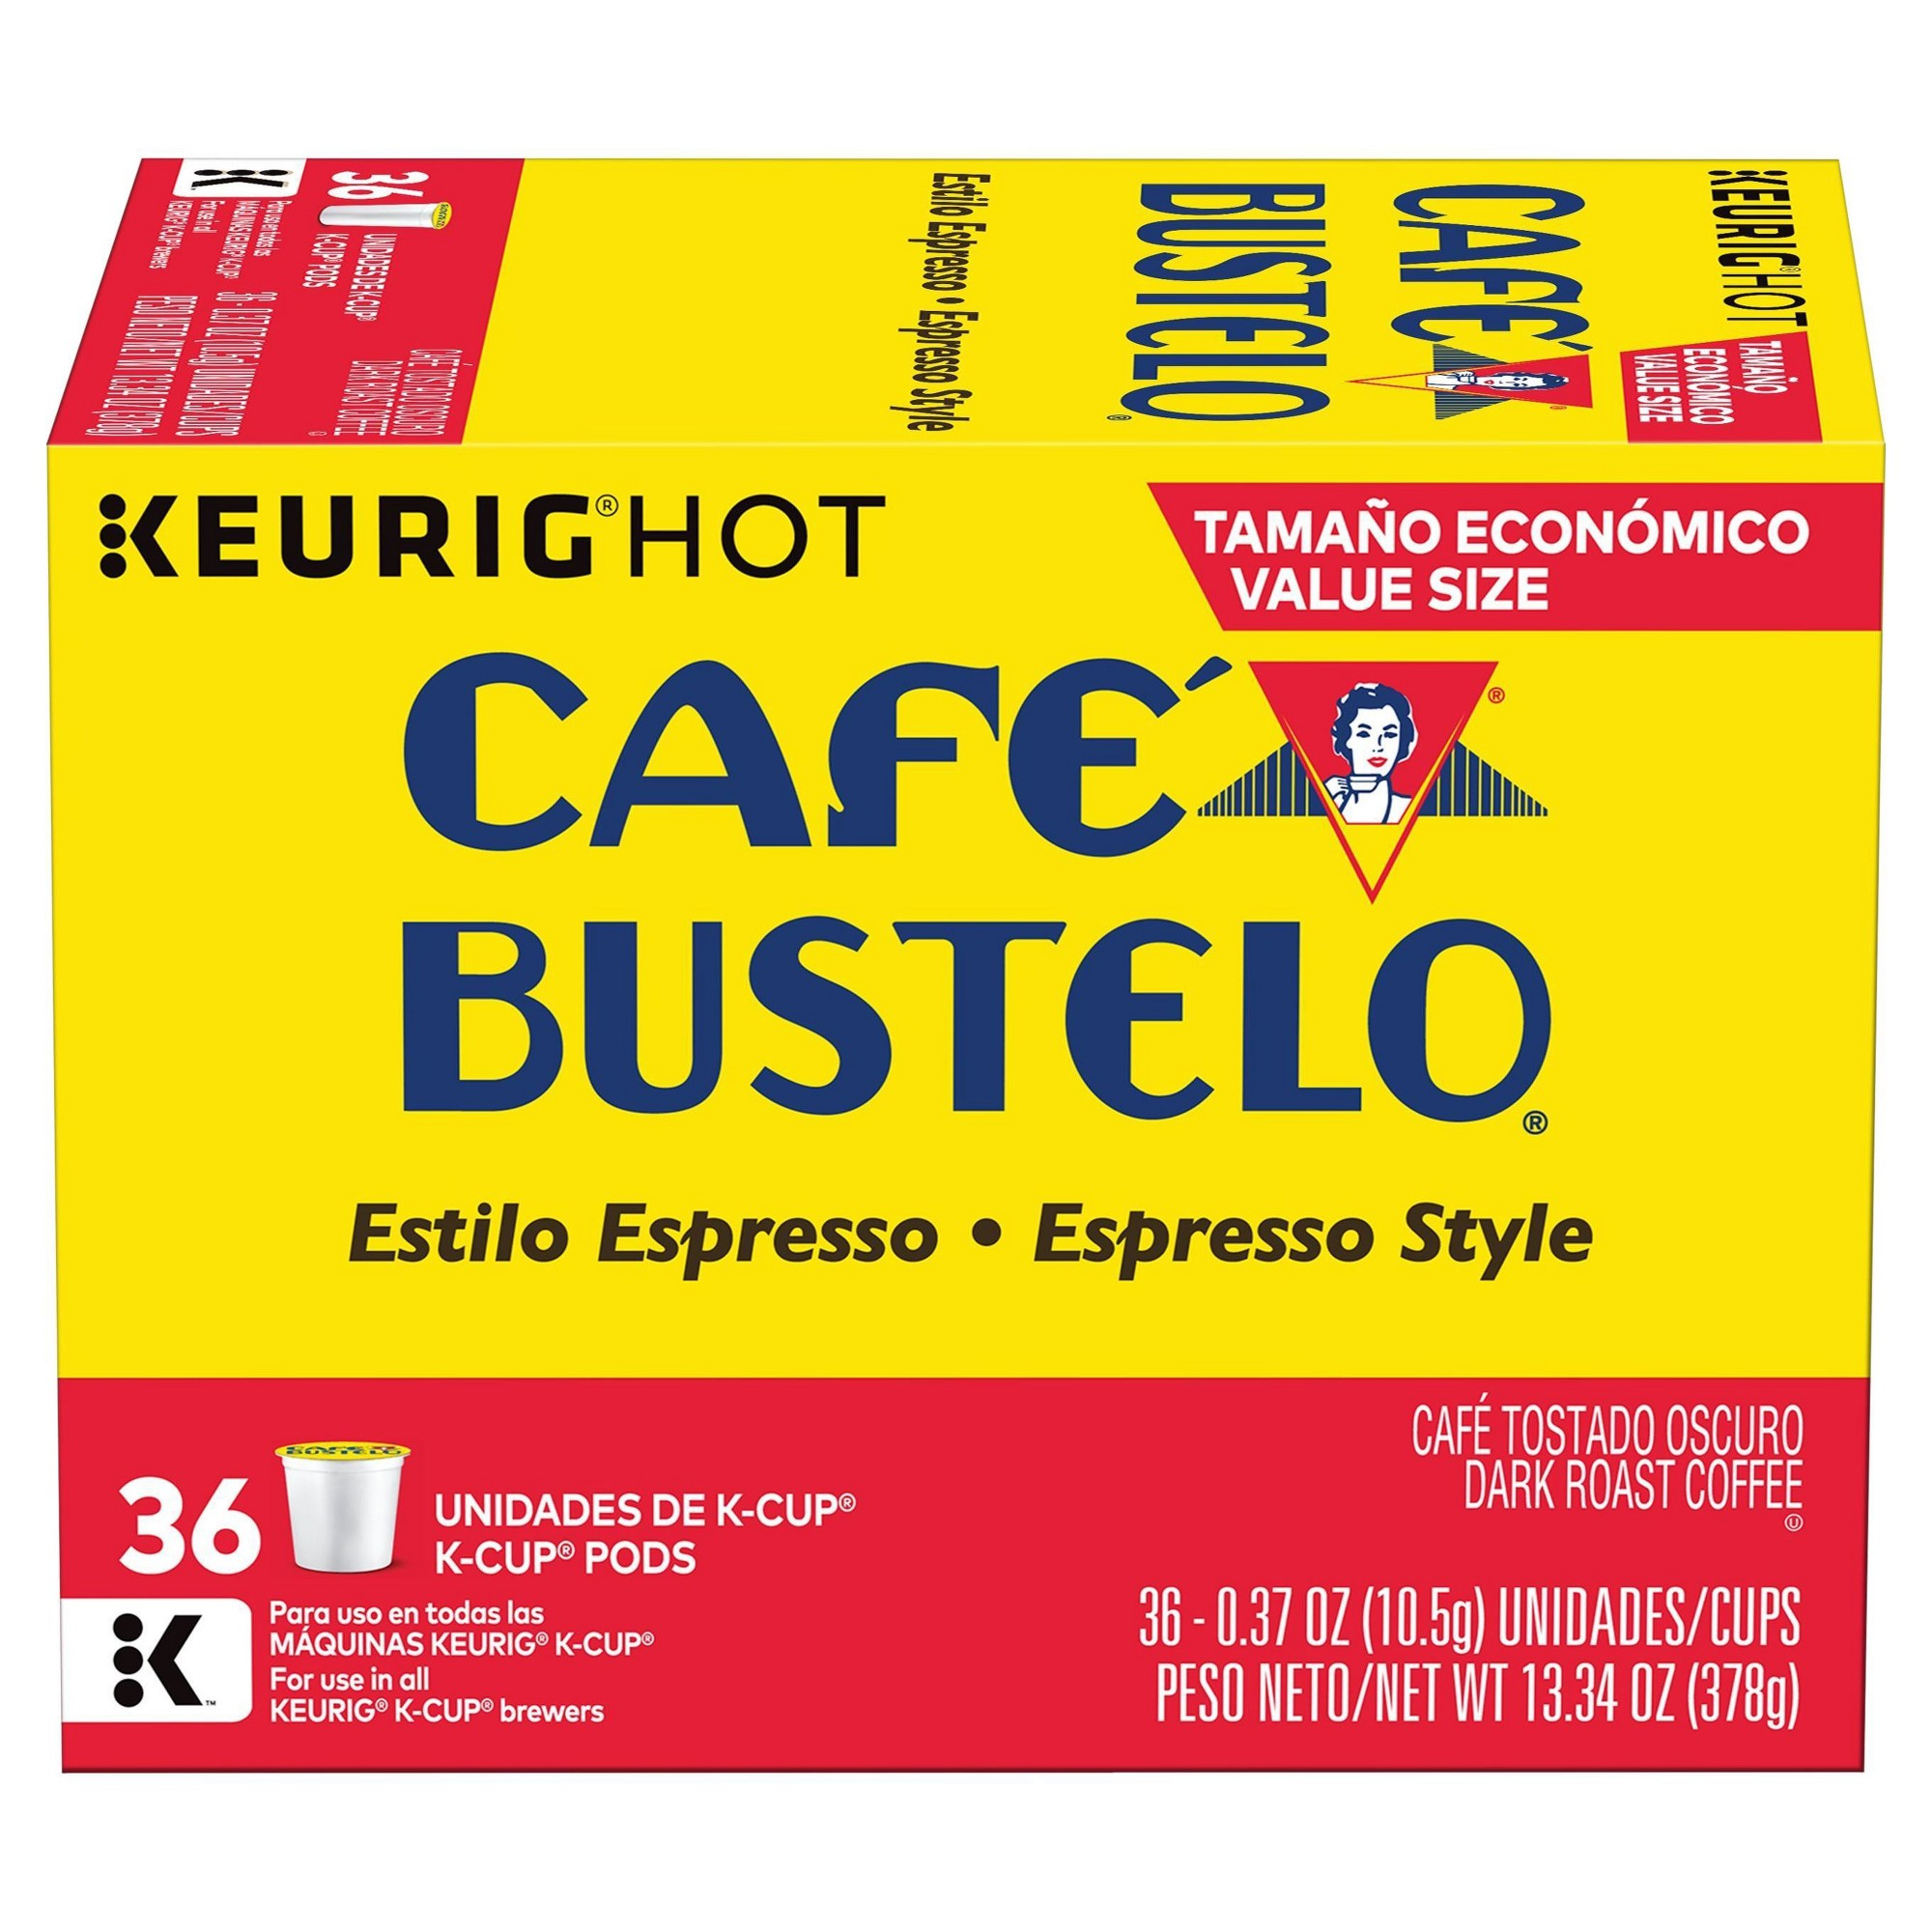 Cafe Bustelo Espresso Dark Roast Coffee Keurig K Cups Pods 36ct Espressocoffee Dark Roast Coffee Cafe Bustelo Coffee Roasting